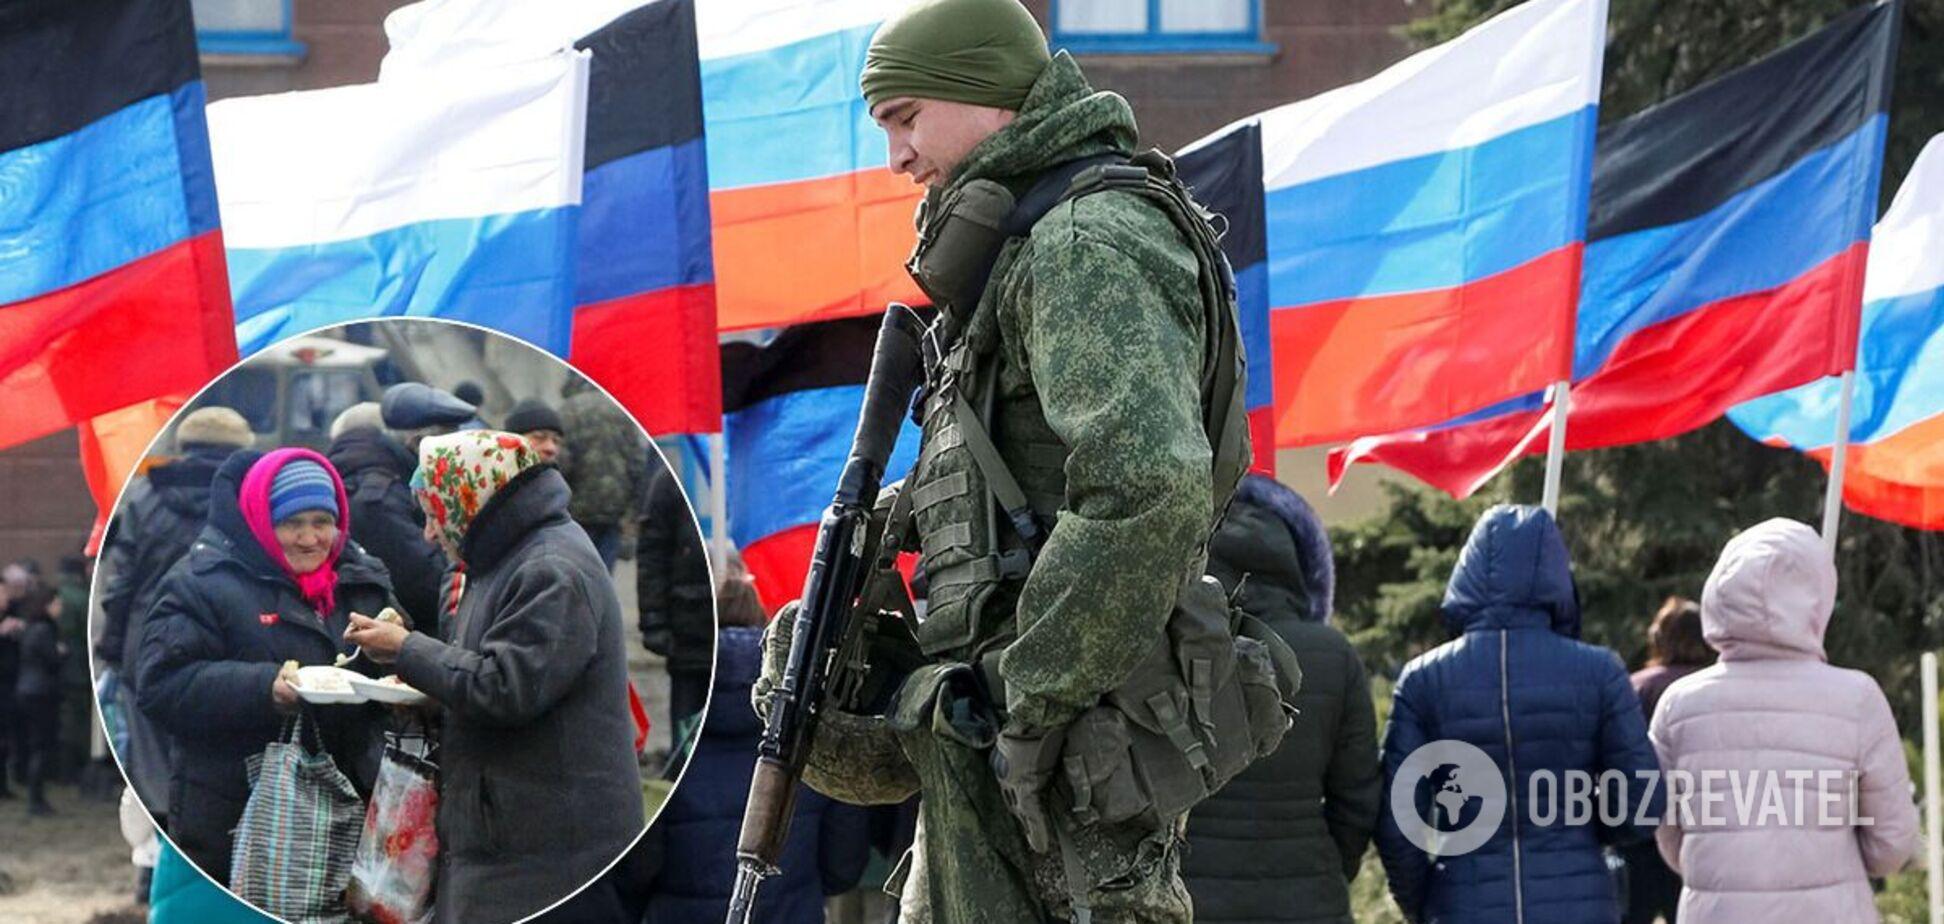 Россия скоро перестанет платить пенсии 'Л/ДНР', – Гармаш